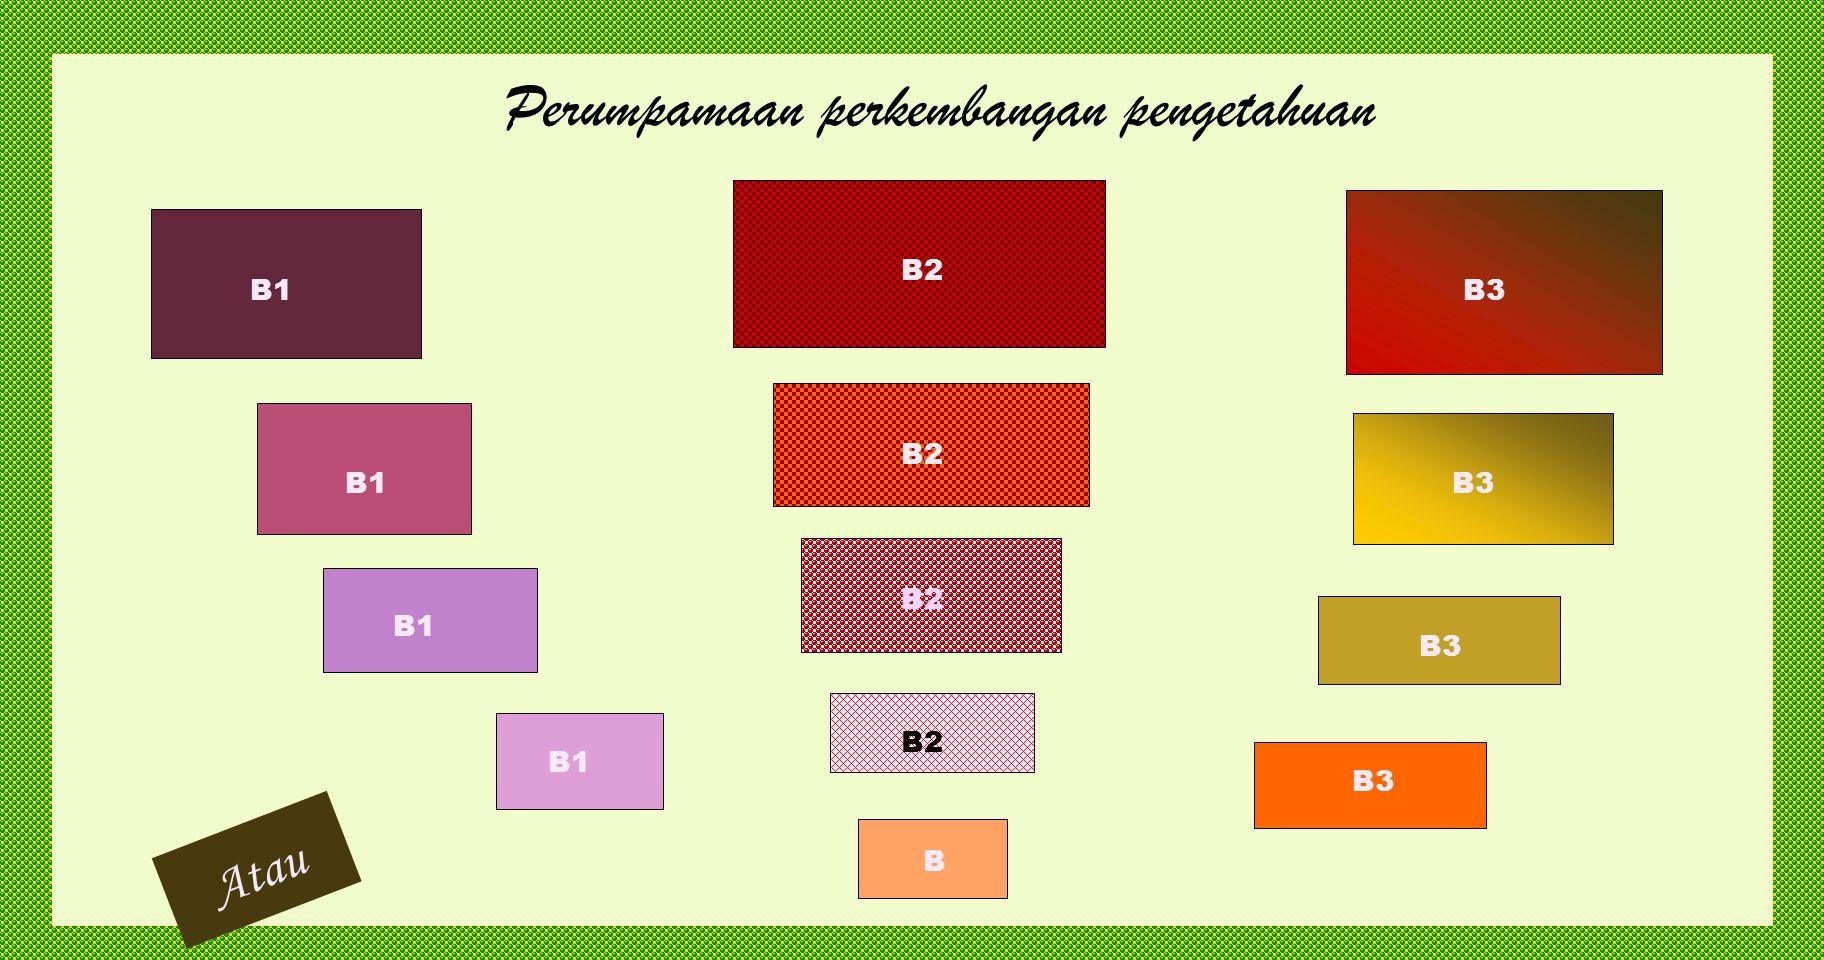 Perumpamaan perkembangan pengetahuan a1a1 a1a1 a1a1 a1a1 a a3a3 a2a2 a2a2 a2a2 a2a2 a3a3 a3a3 a3a3 Atau